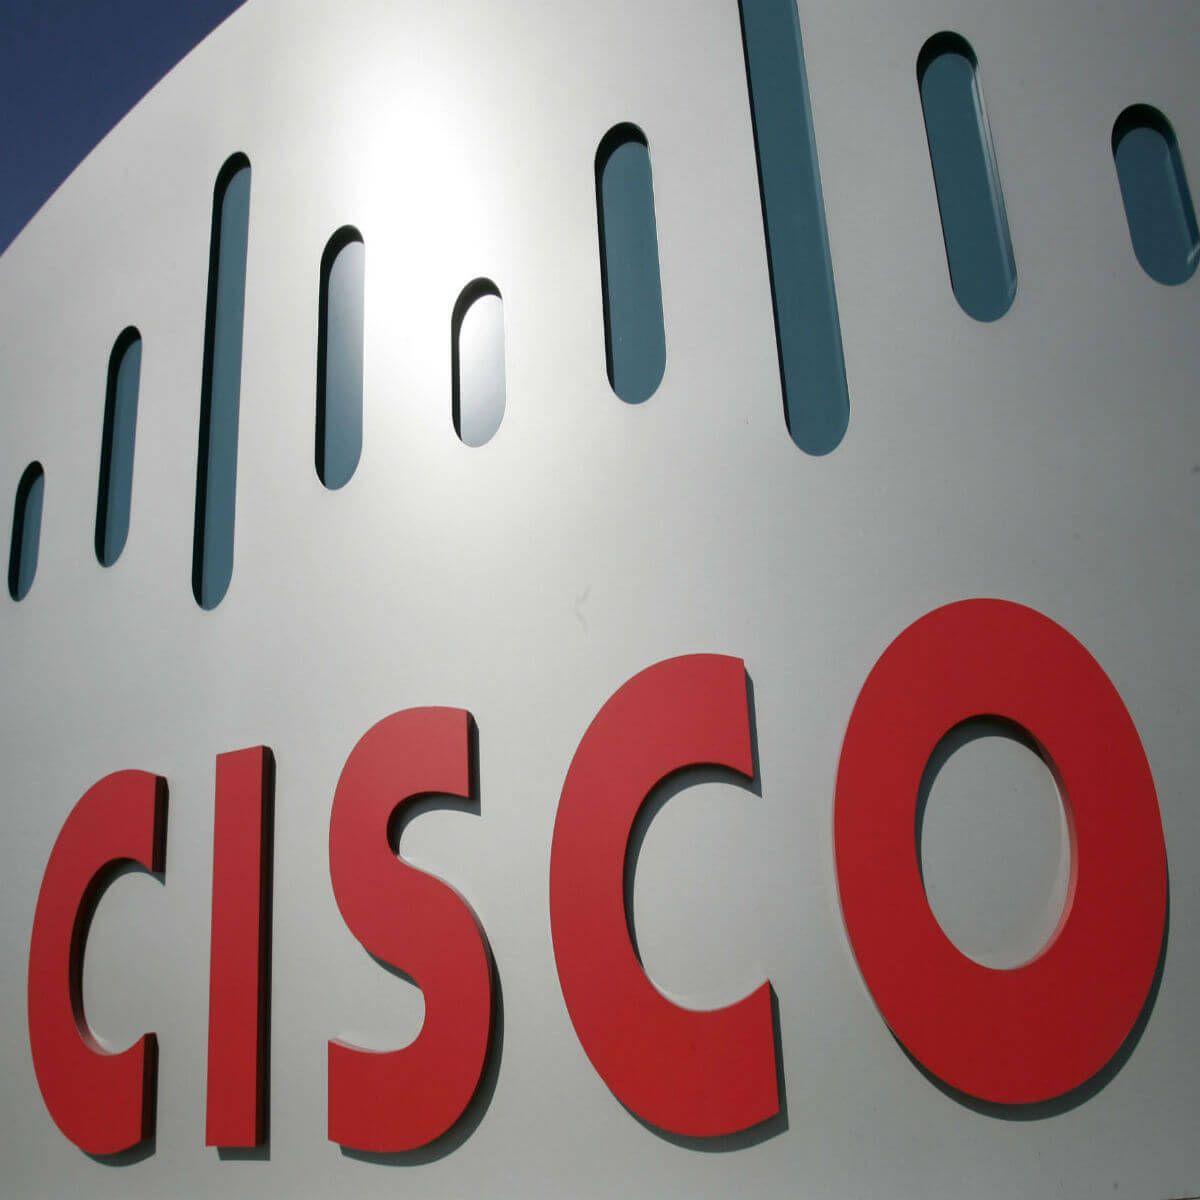 ec627f985b2f0fc8ad23cd40c43873ec - Cisco Vpn Client For Android Phone